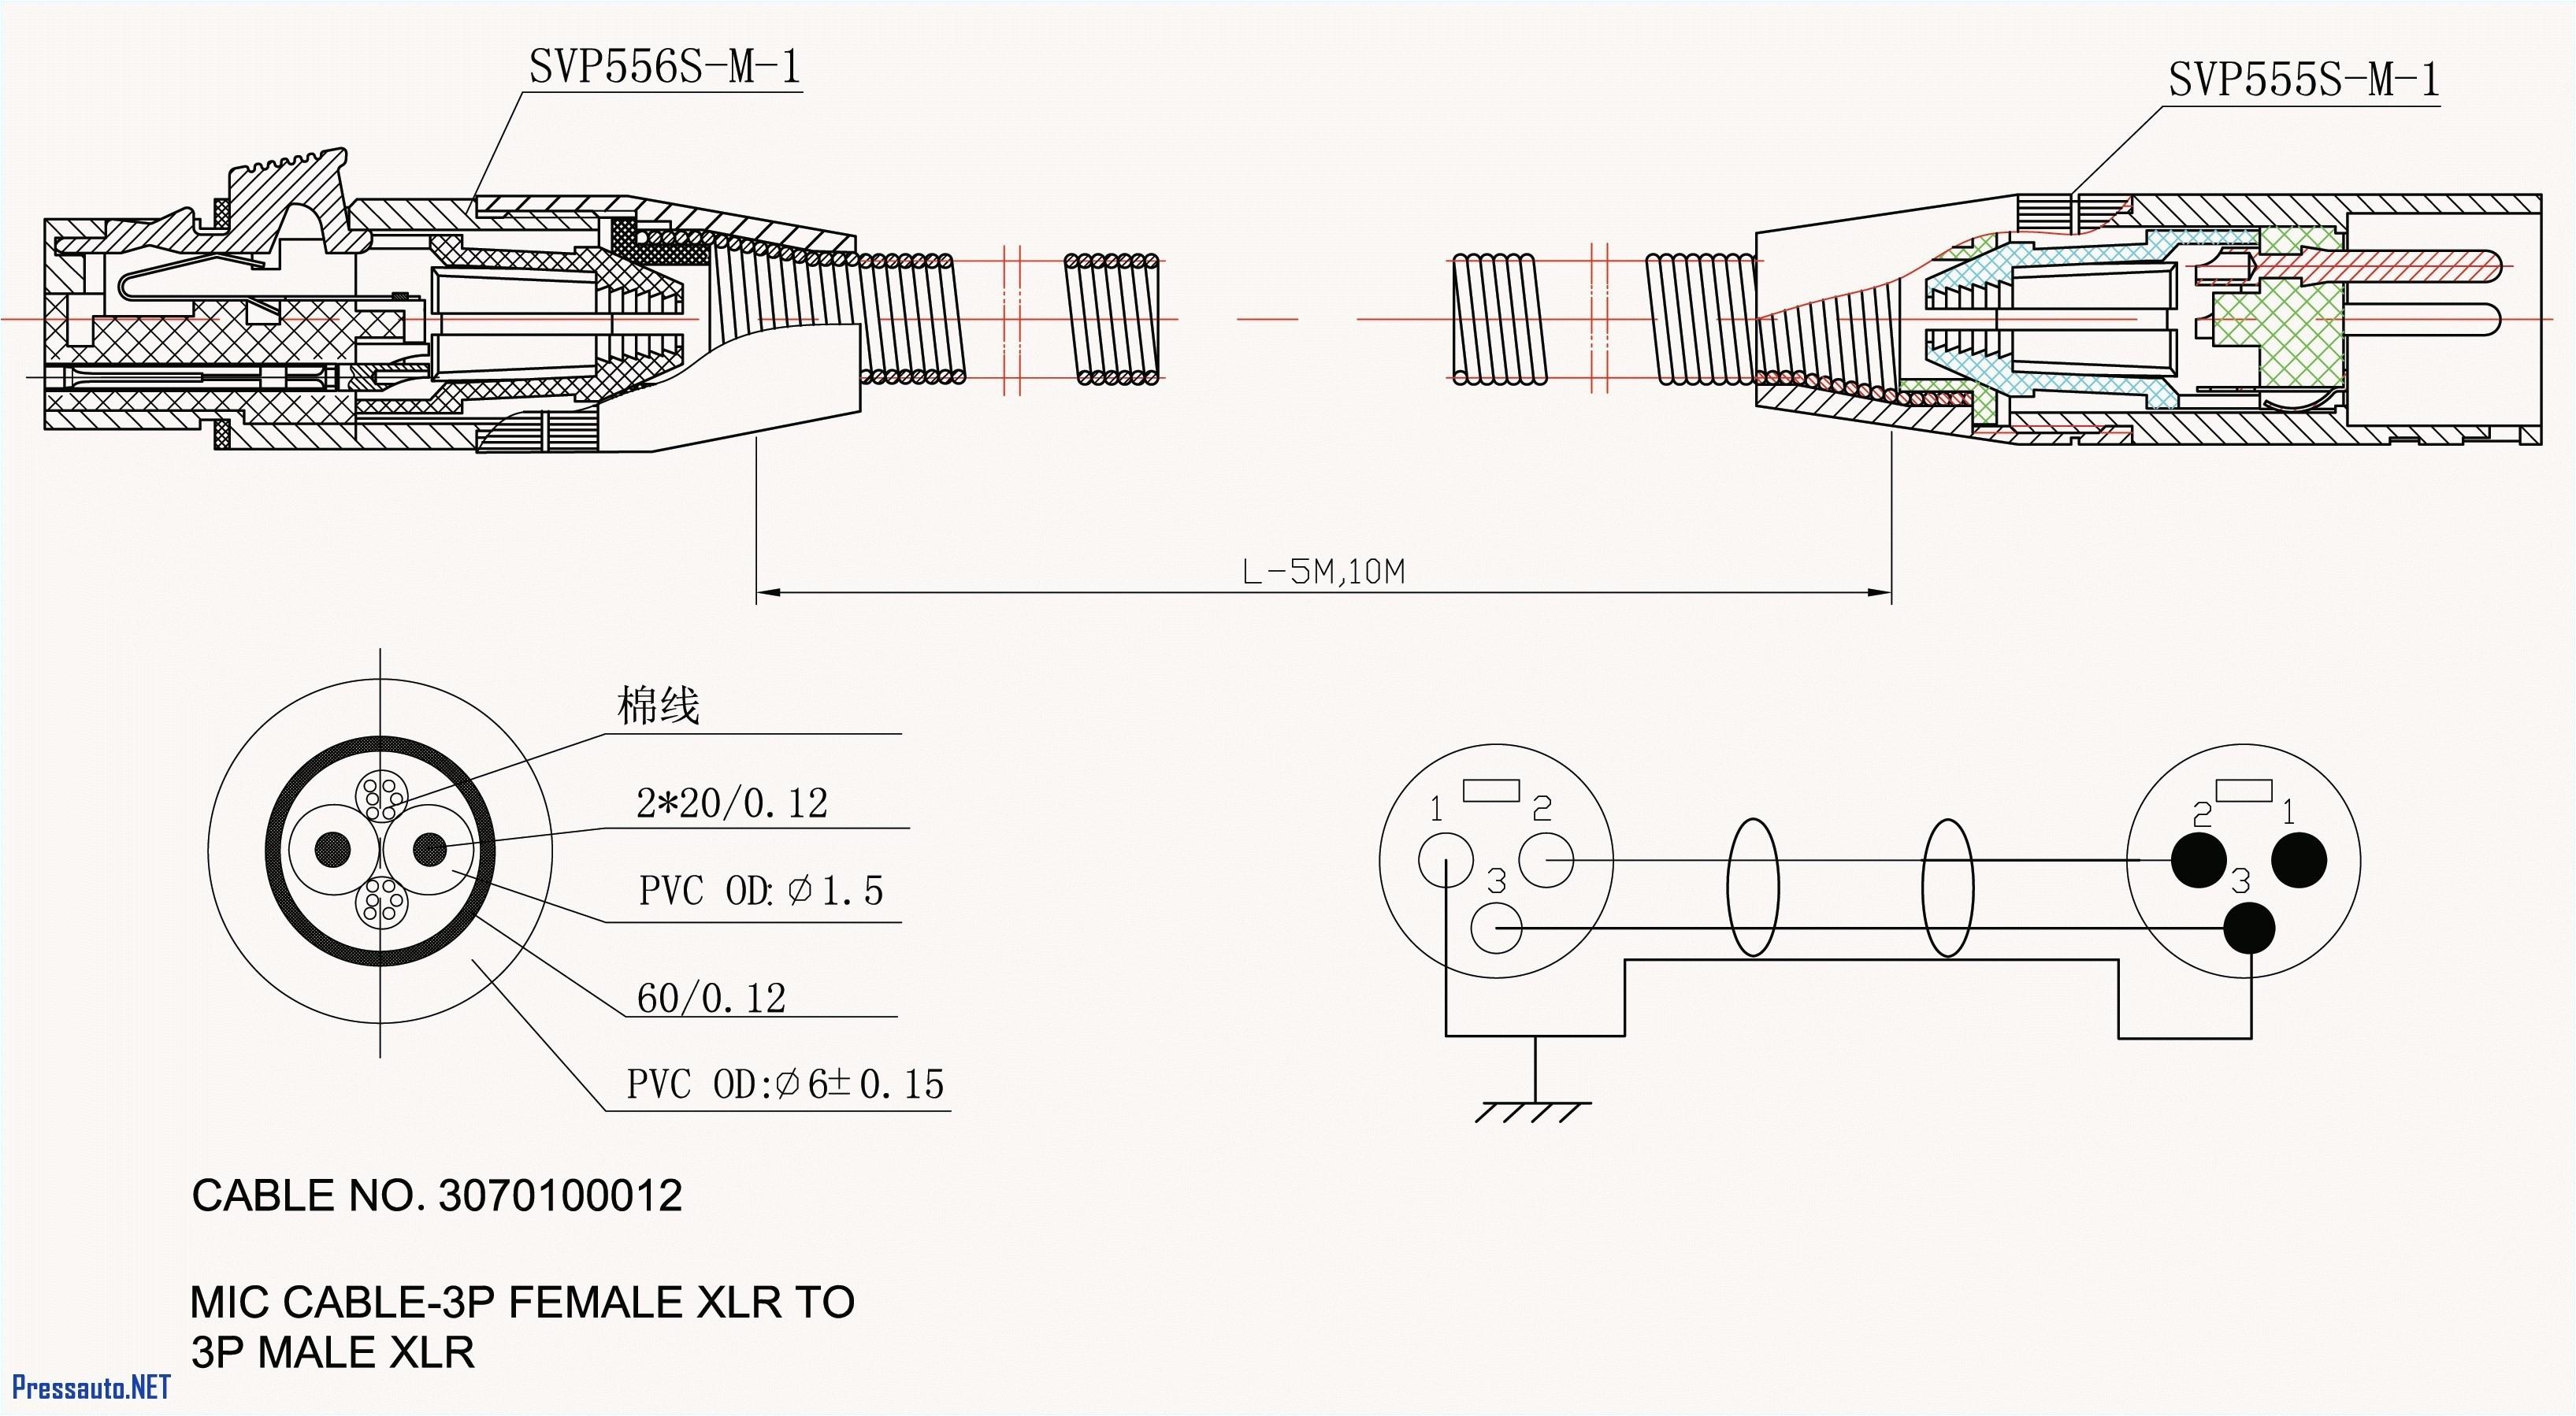 mando marine alternator wiring diagram wiring diagrammercruiser alternator wiring diagram parts save omc new unique boatmercruiser